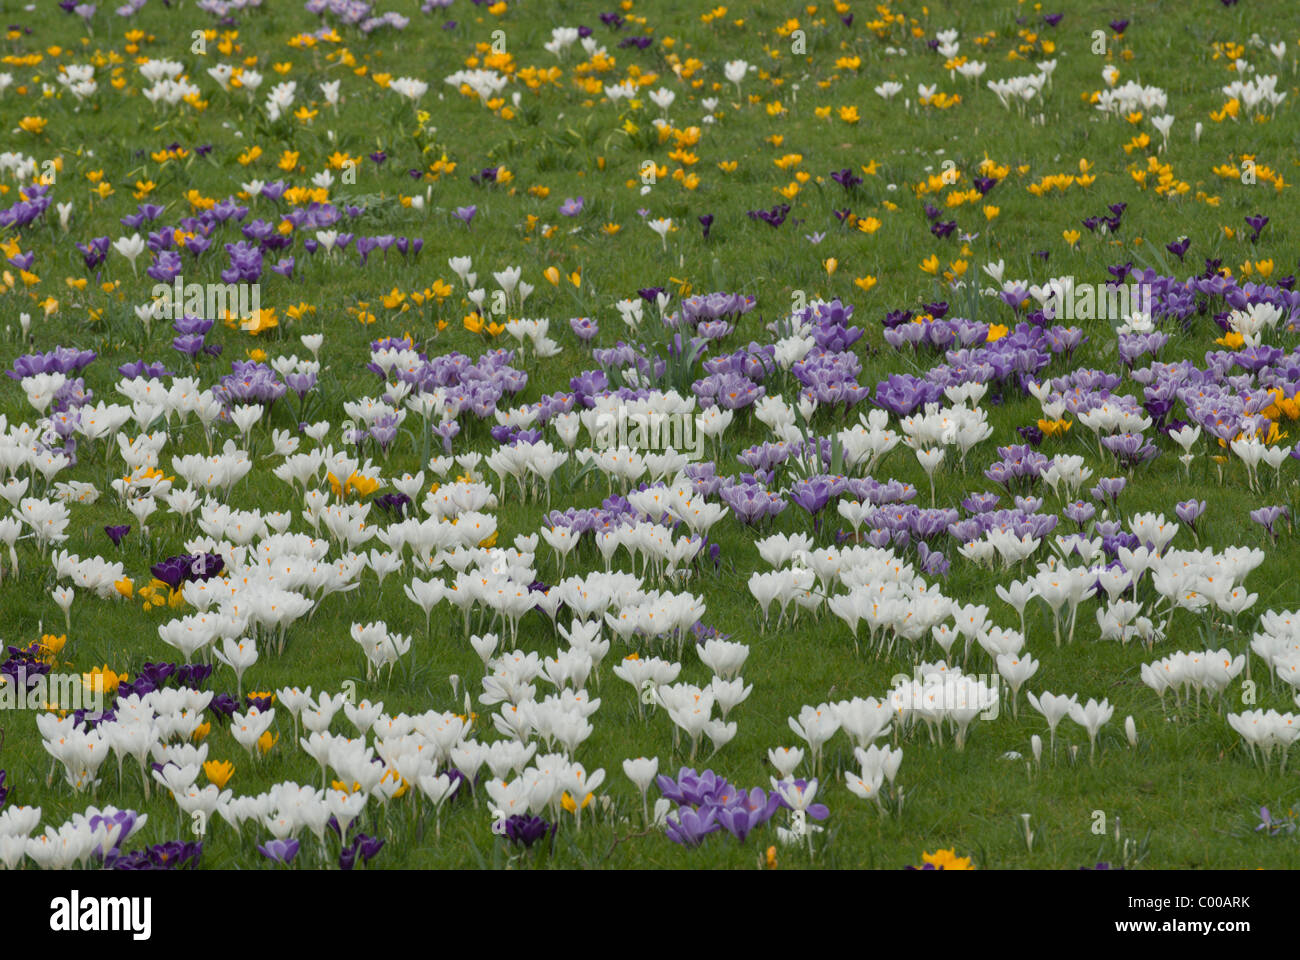 Krokusse, Crocus sativus, Crocus - Stock Image